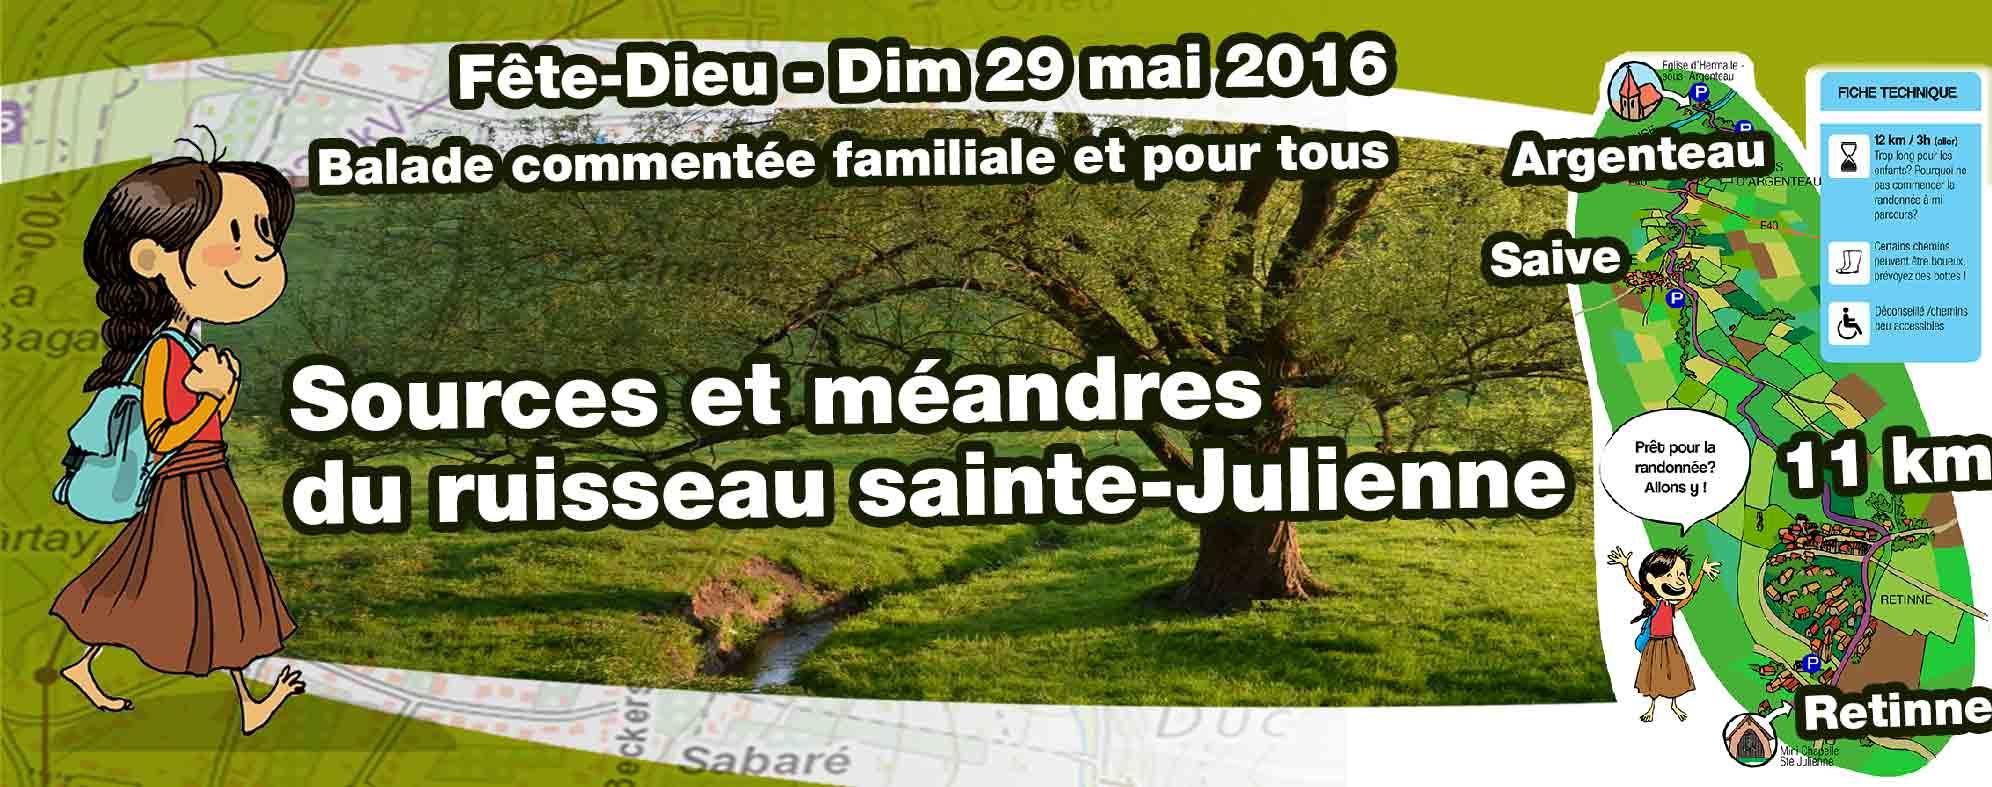 Banner-Rando-Julienne-Fete-Dieu-2016-253x100-200dpi